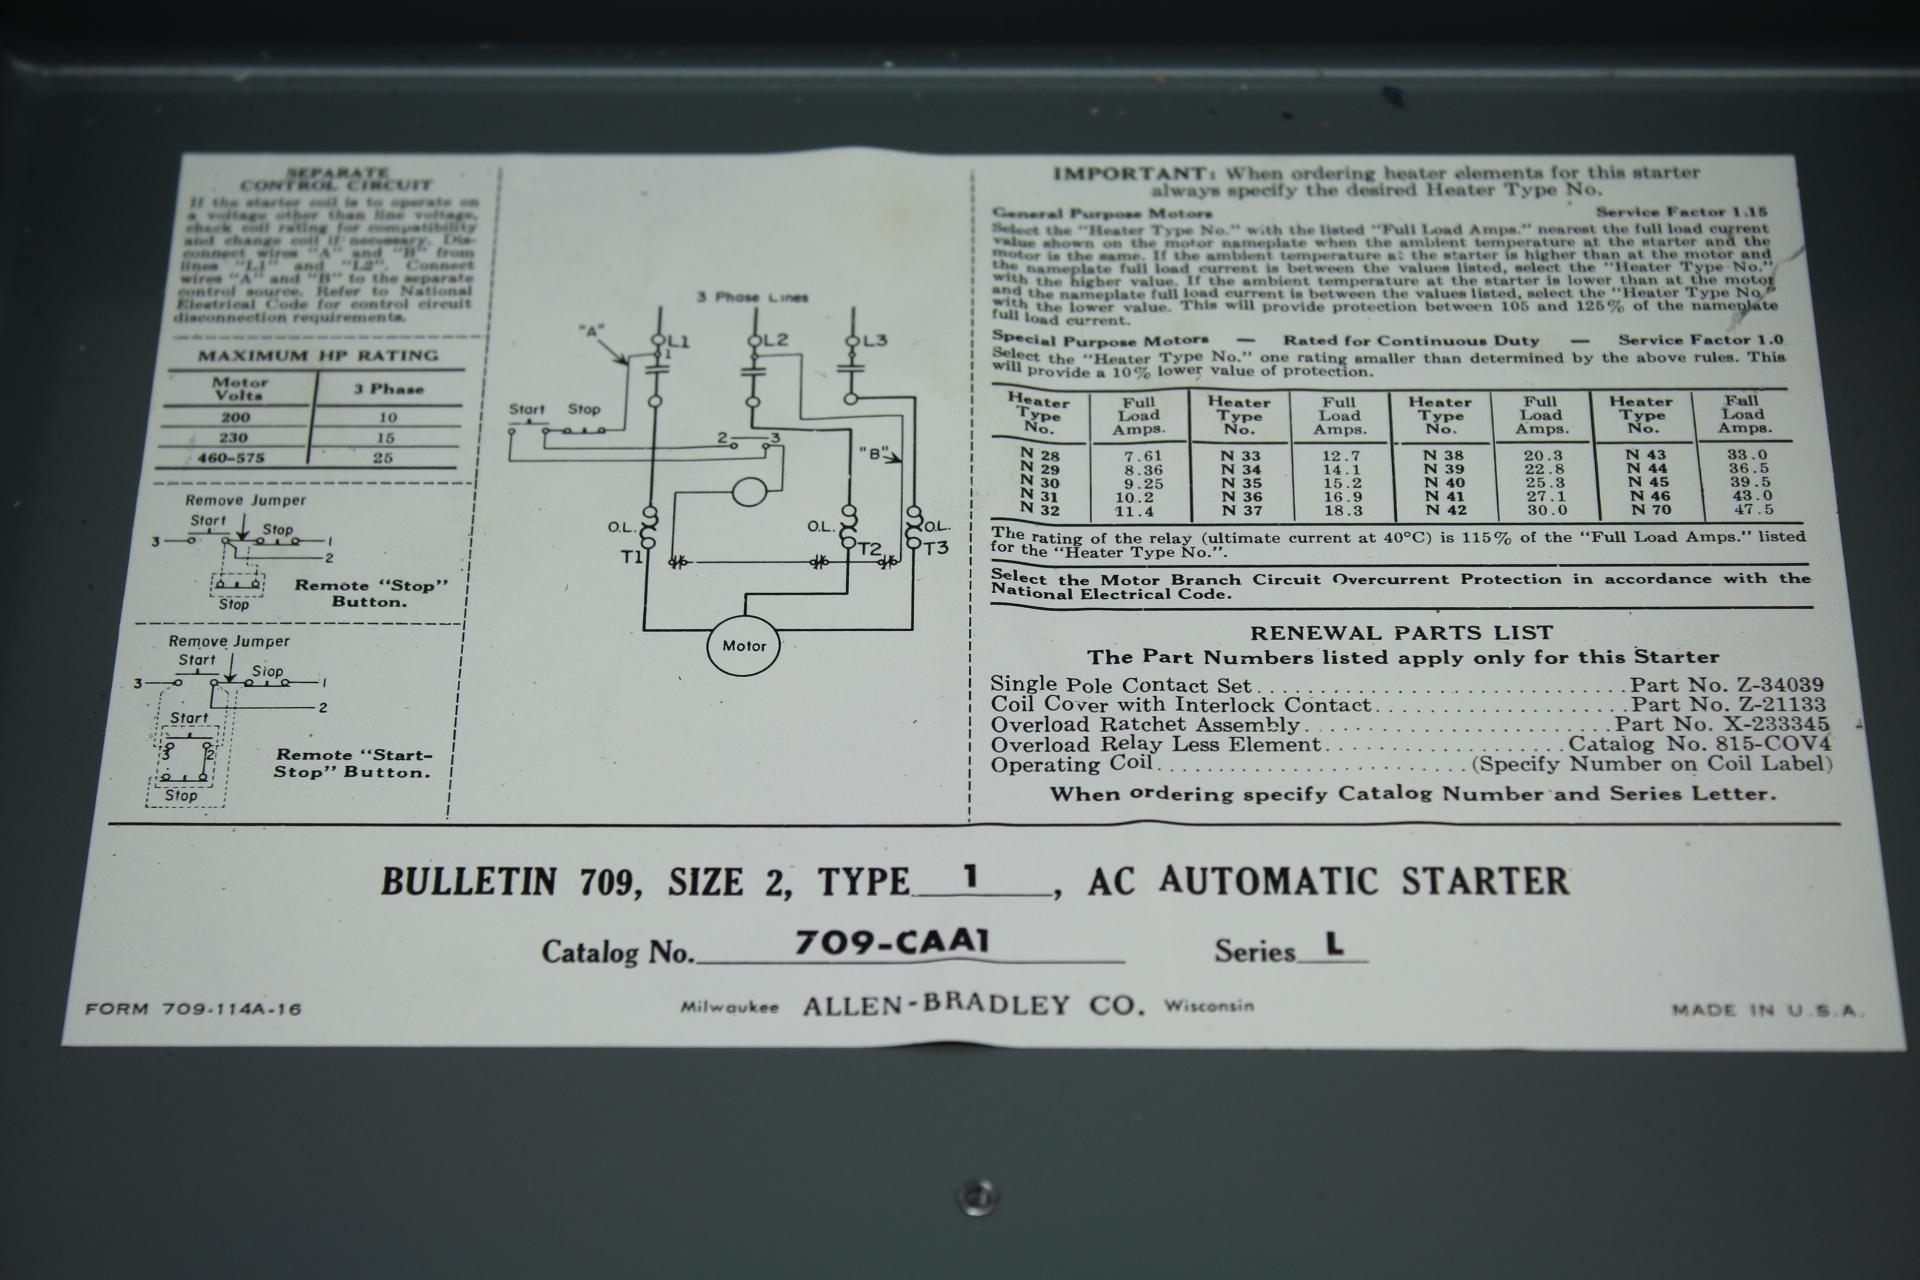 Allen-Bradley Bulletin 709, Size 2, Type 1, AC Automatic Starter CAT ...